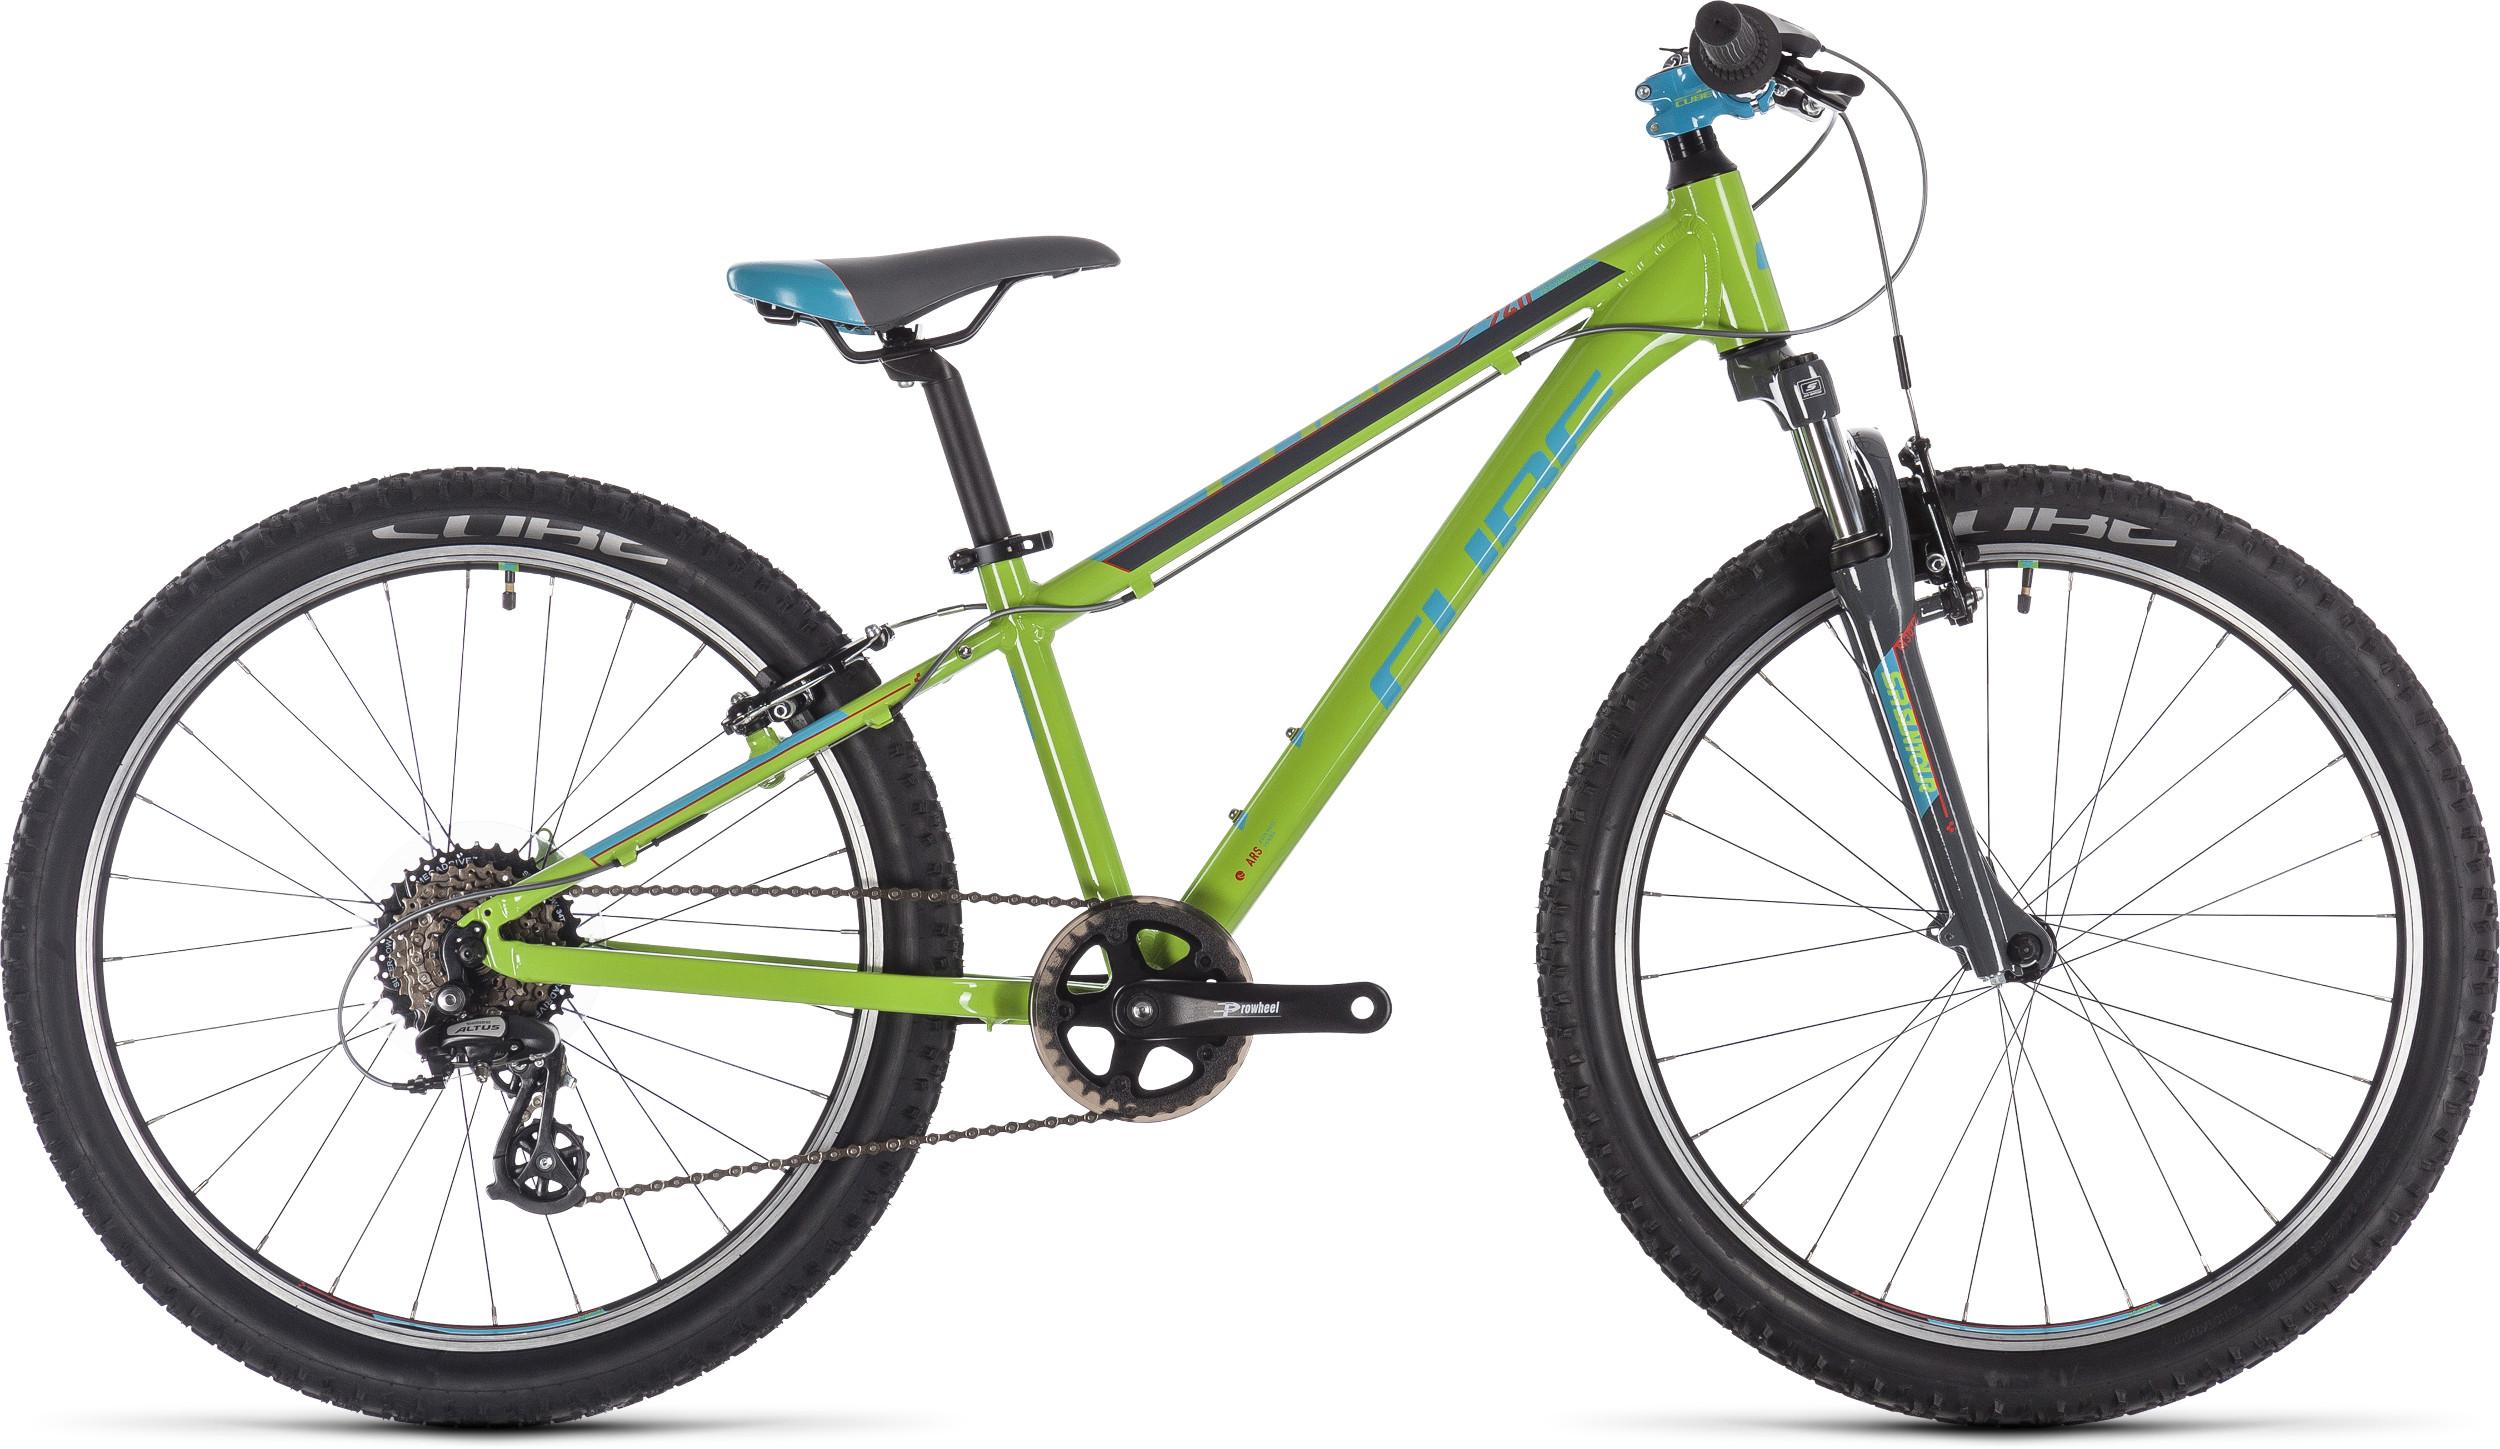 Cube Acid 240 Kids Bike 2019 Green/Blue/Grey